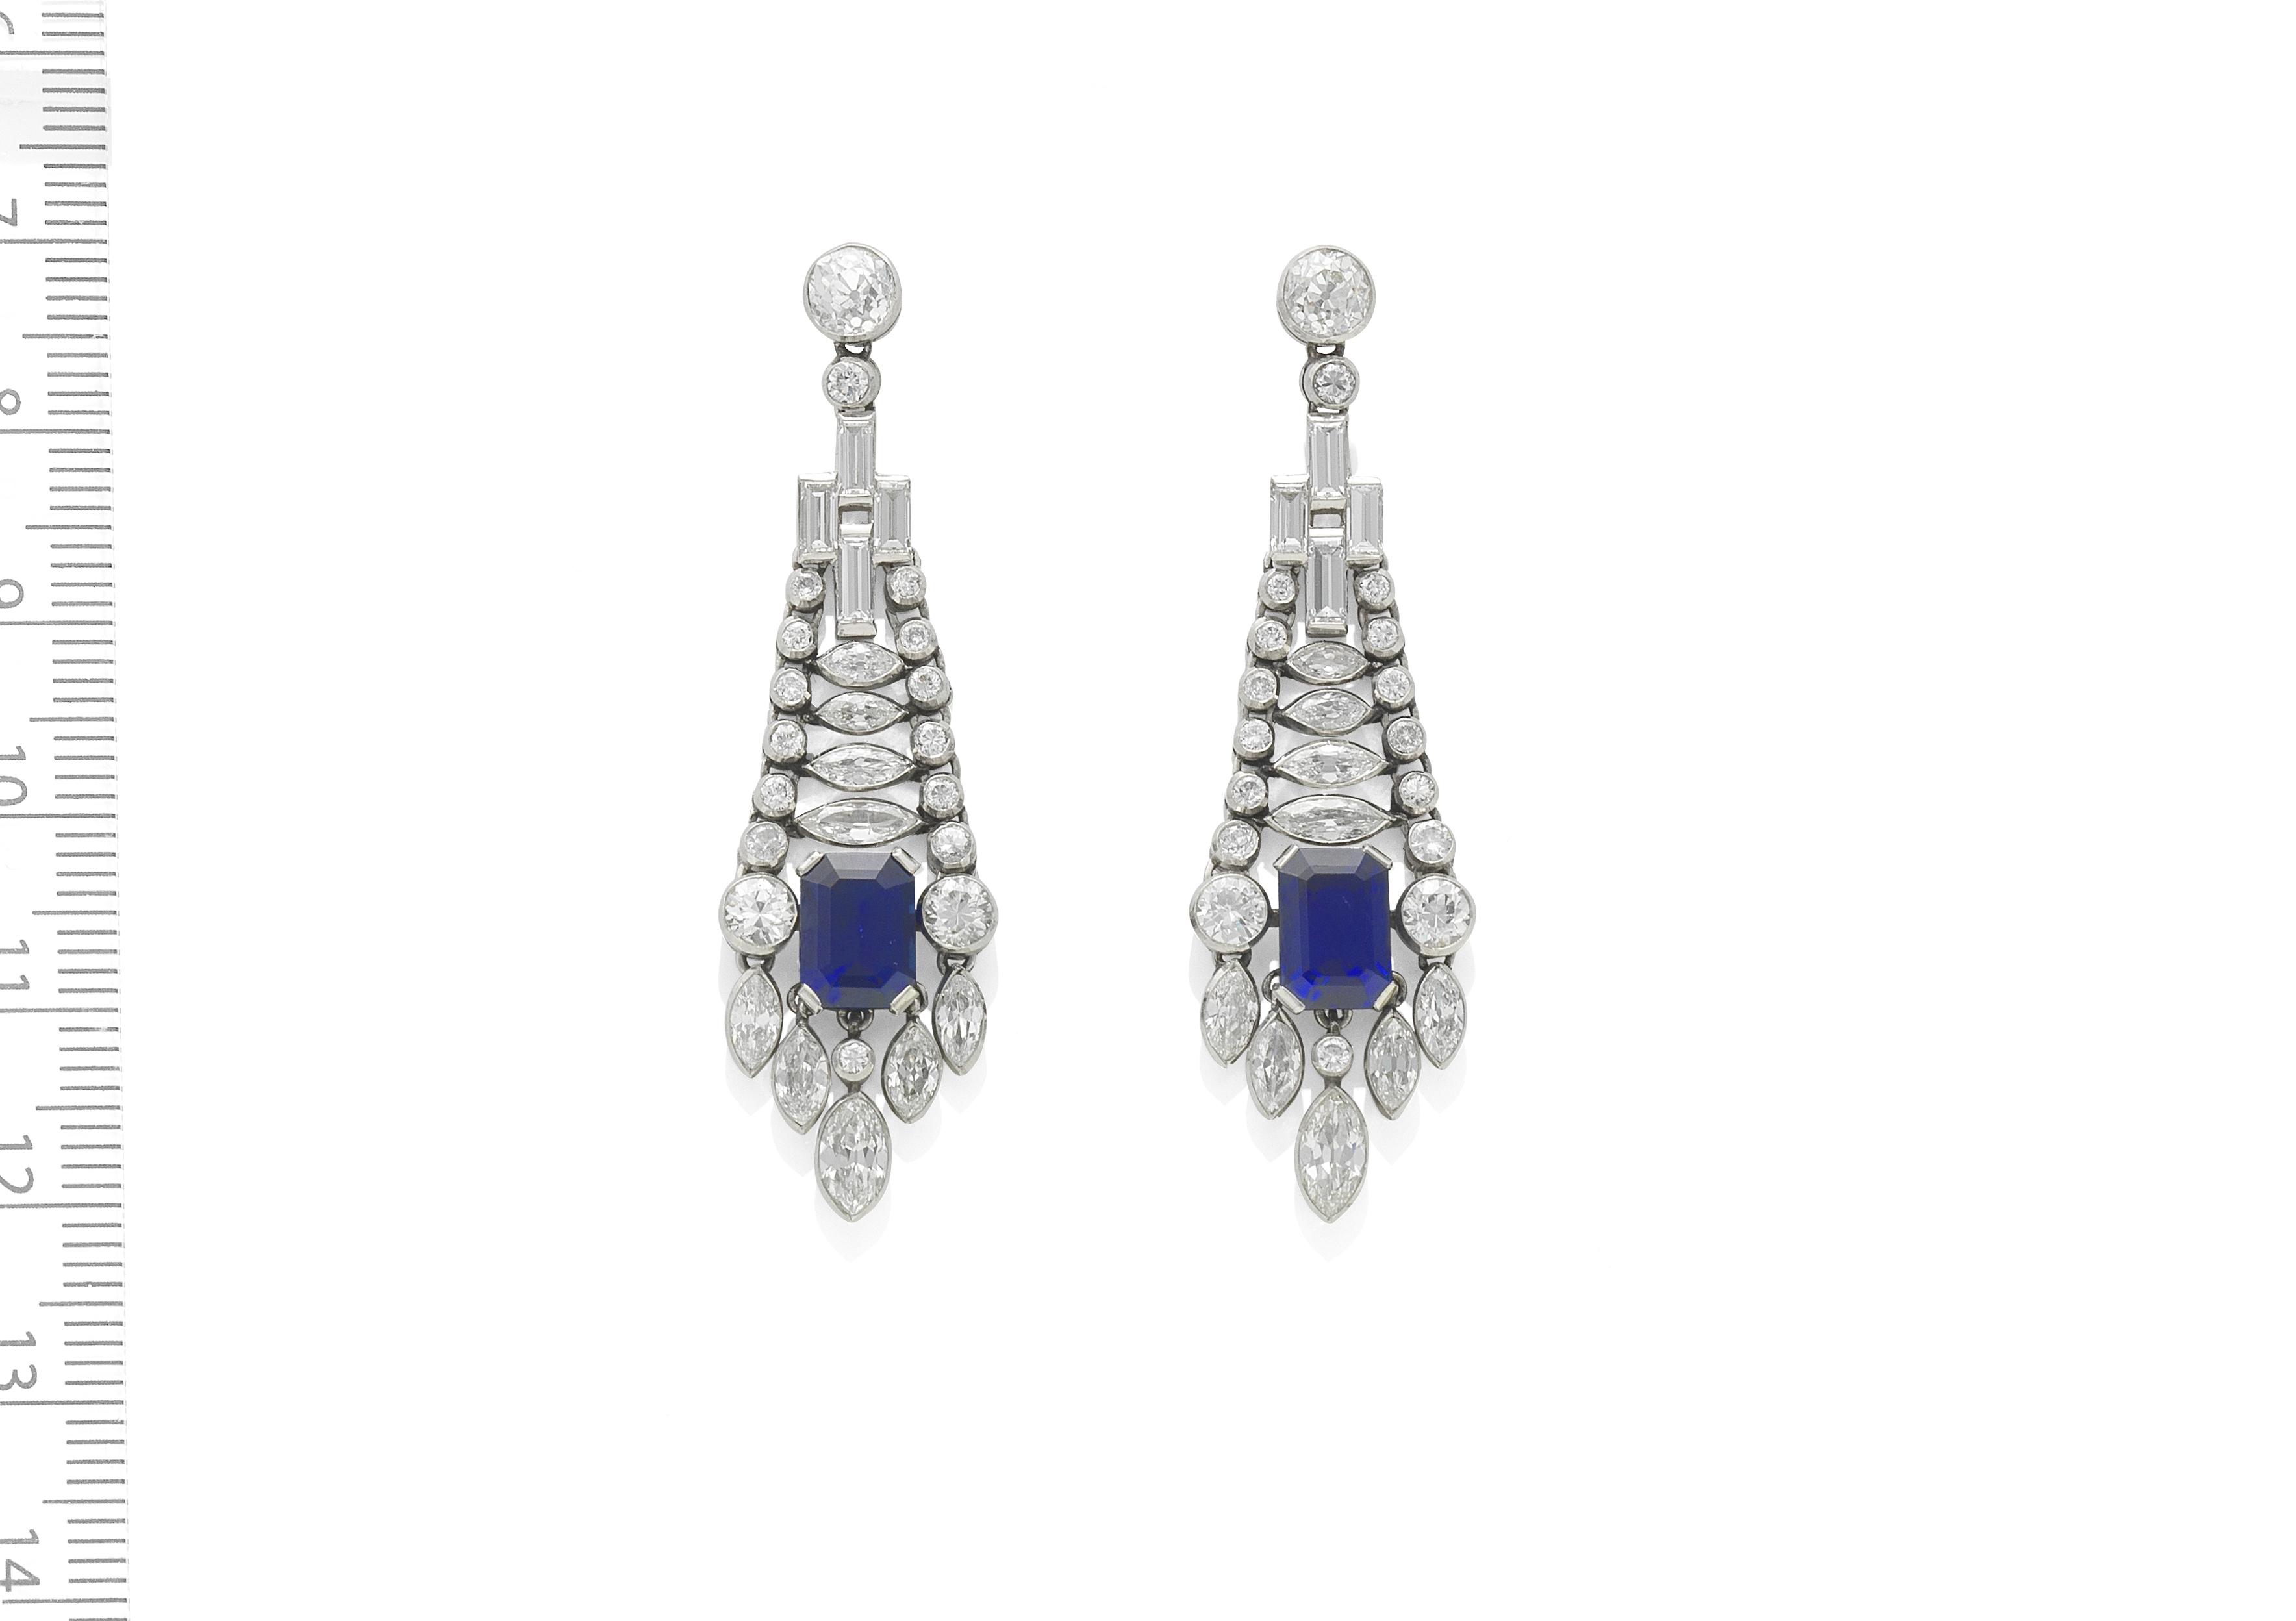 SAPPHIRE AND DIAMOND PENDANT EARRINGS